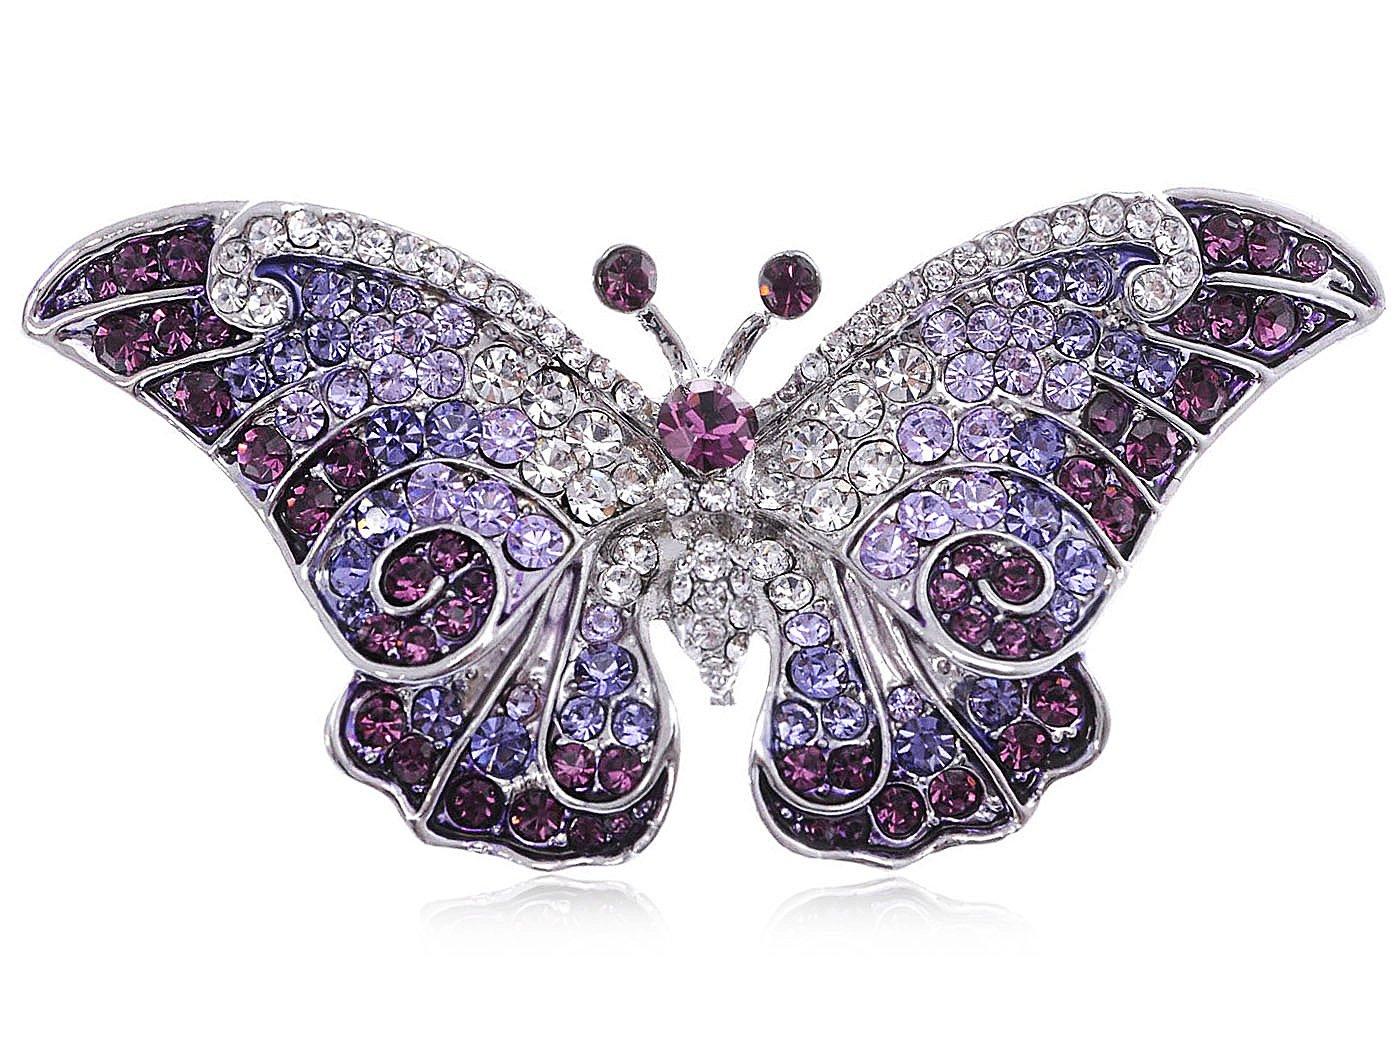 Empress Monarch Winged Butterfly Swarovski Crystal Rhinestones Brooch Pin - Purple